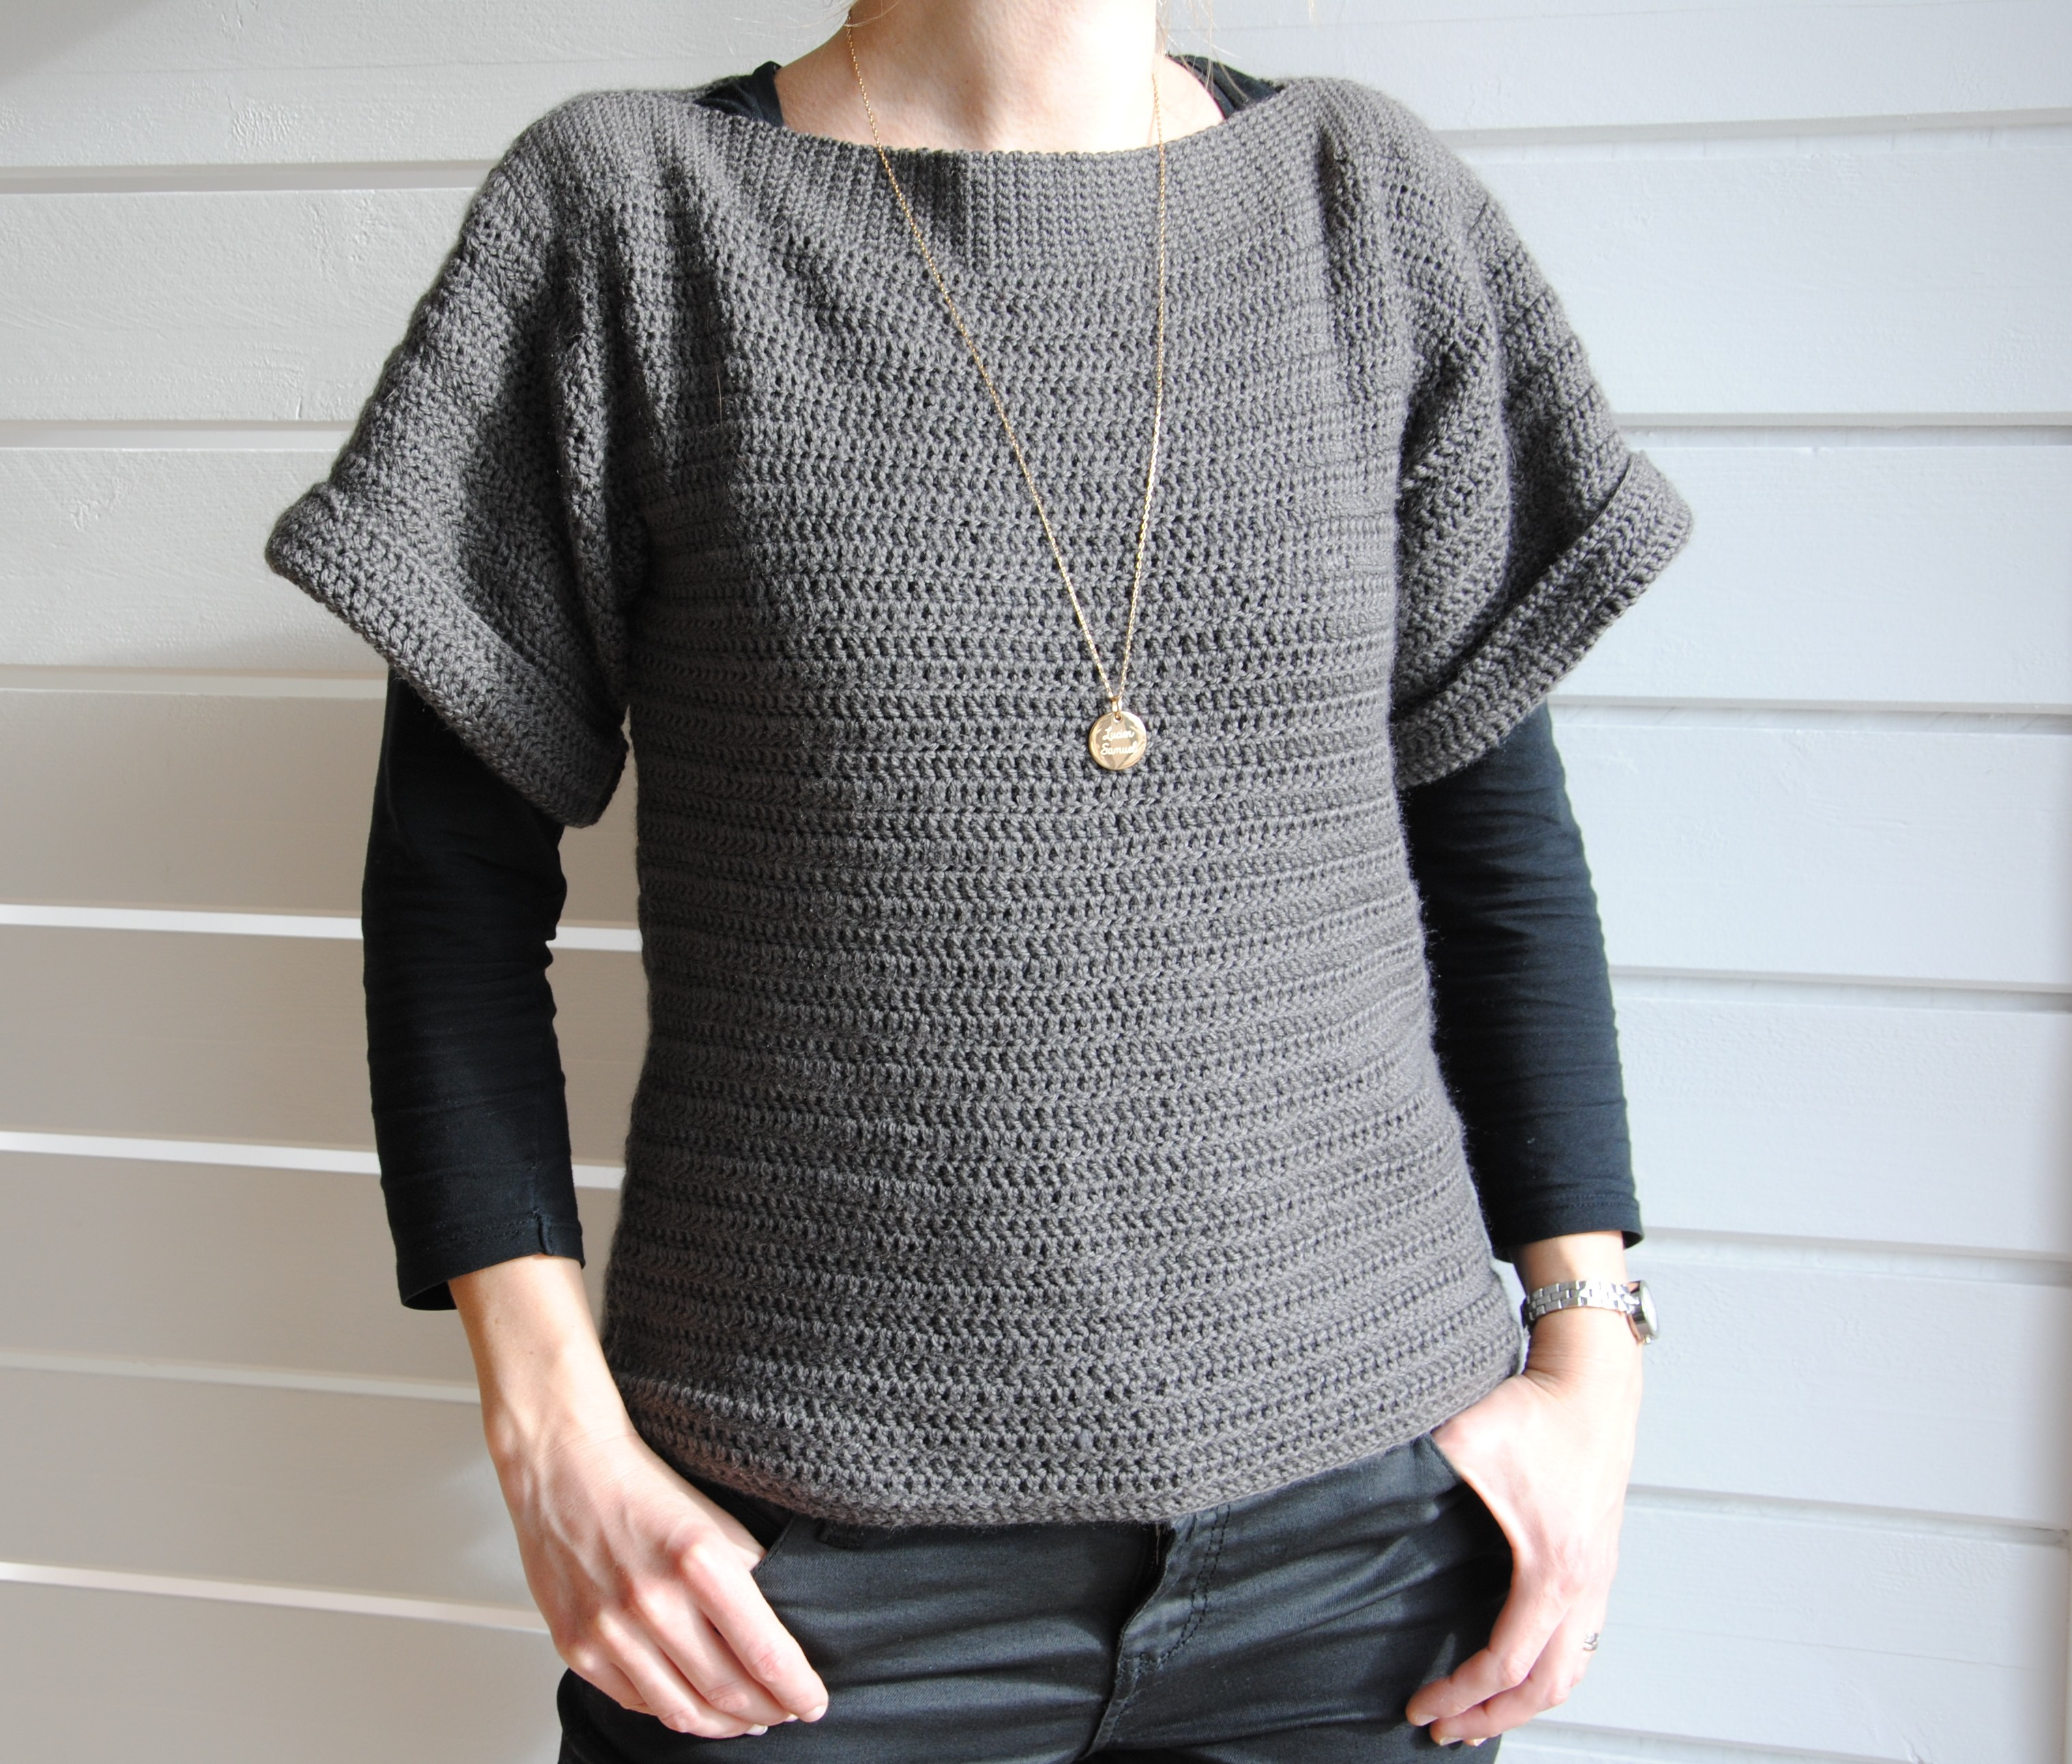 tuto un pull en crochet tr s facile dos ajour le blog de caro tricote. Black Bedroom Furniture Sets. Home Design Ideas